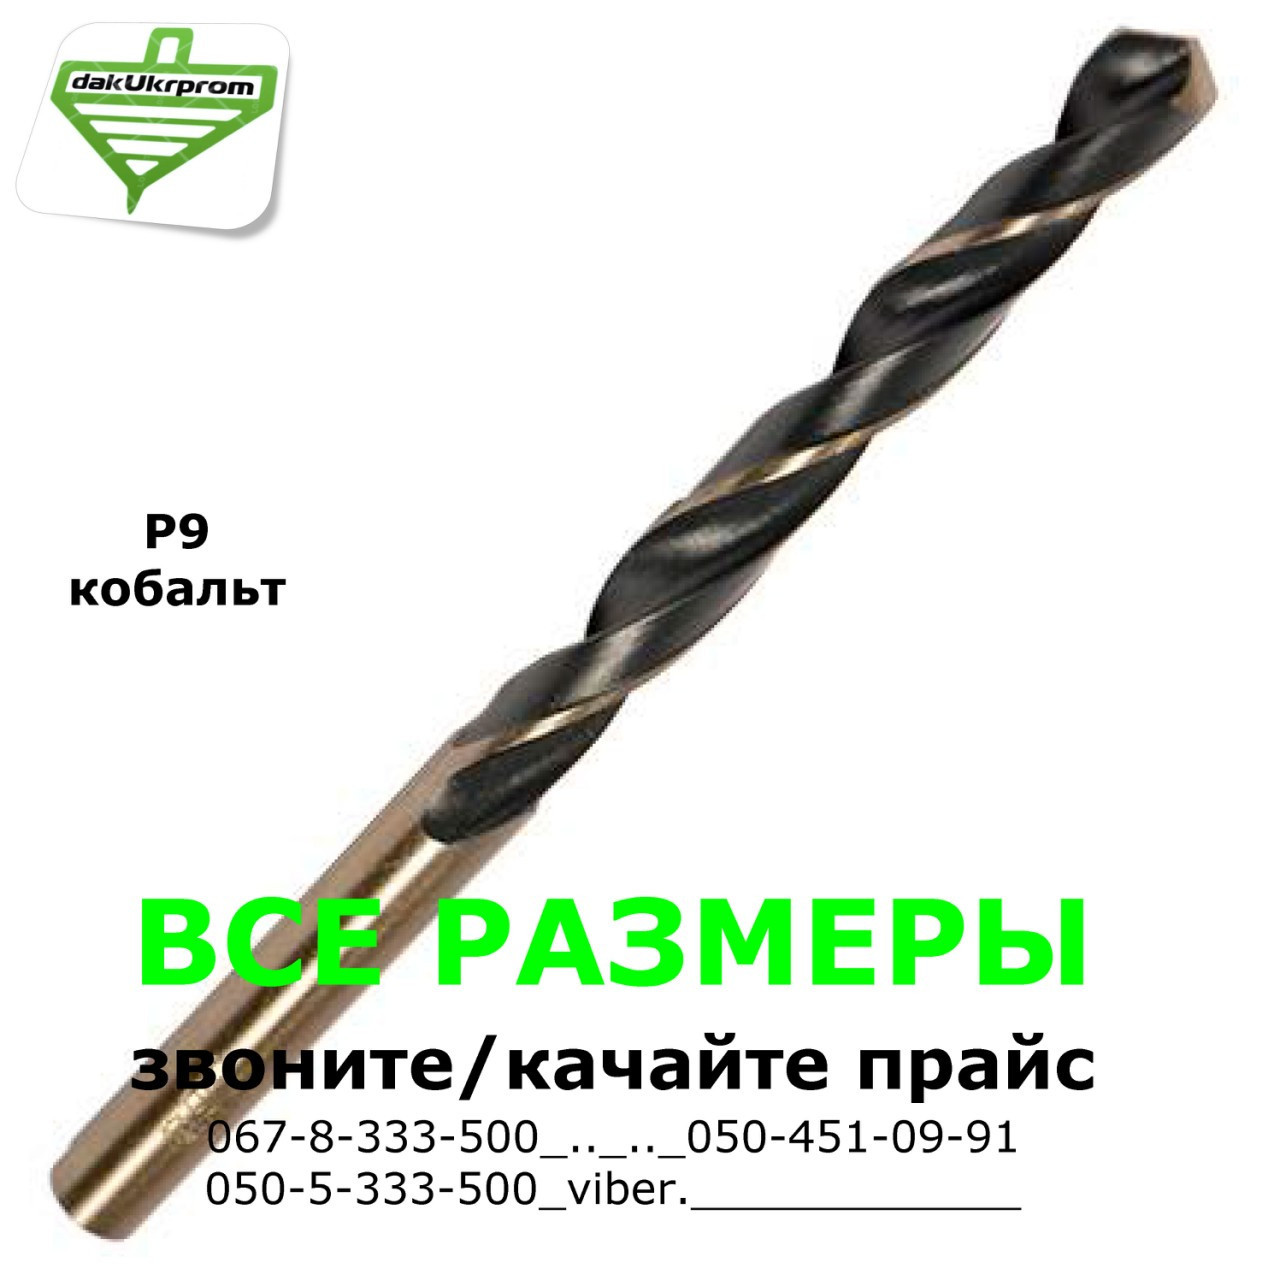 Сверло по металлу 4.3 мм  Р9(кобальт) цилиндрический хвостовик